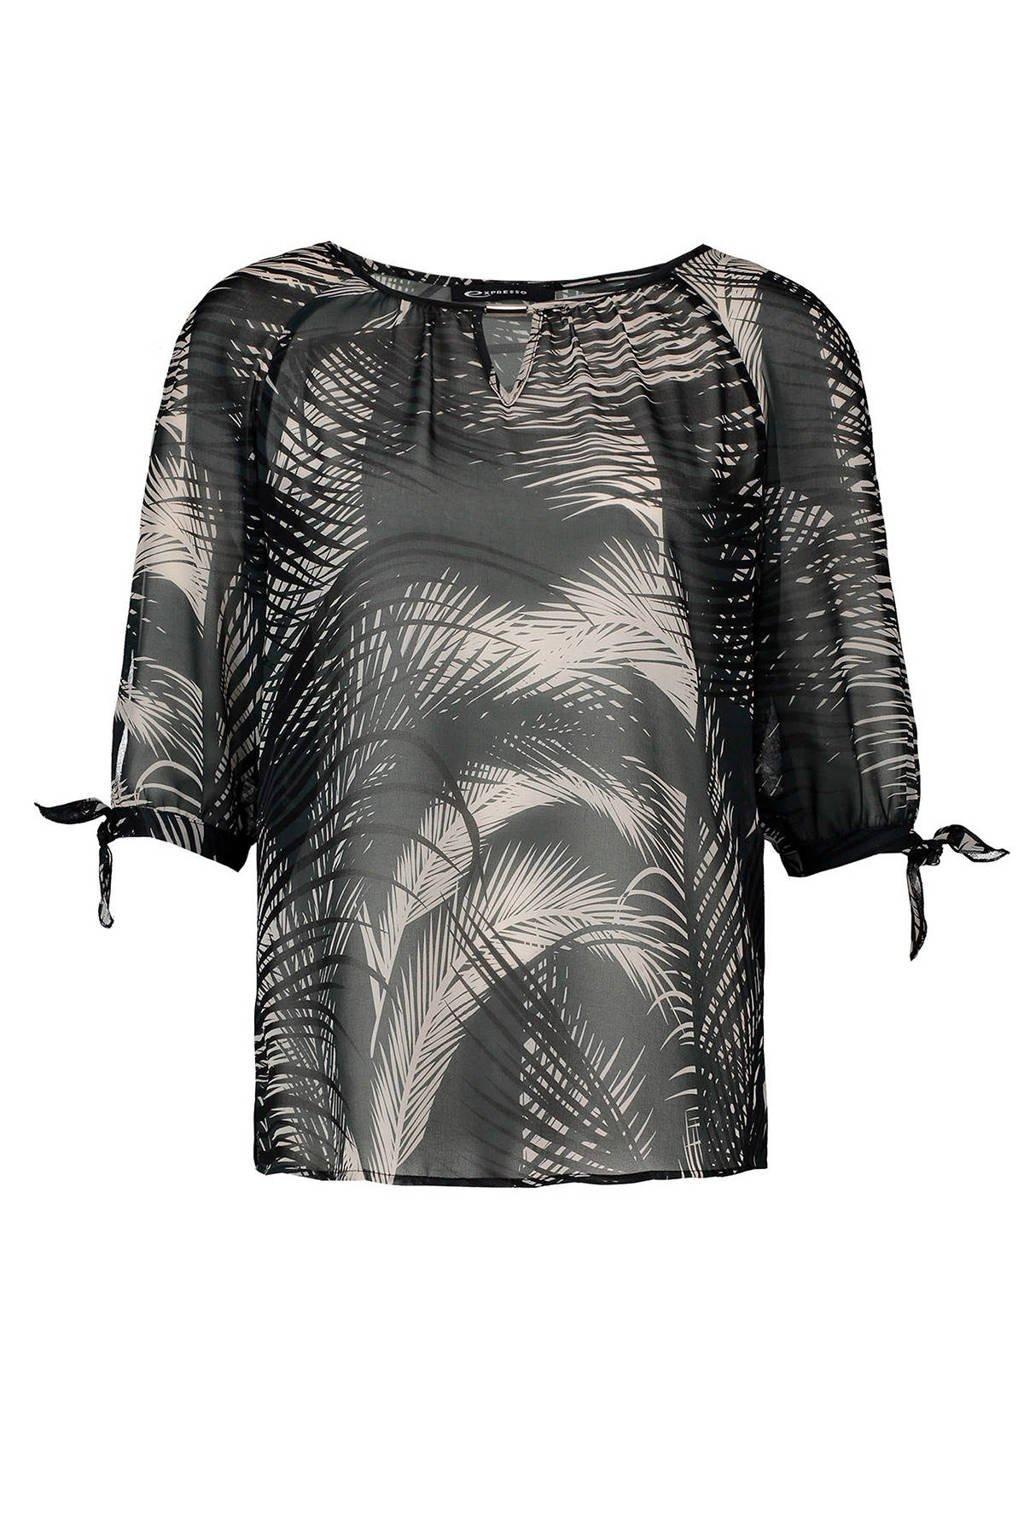 Expresso semi-transparante top met opendetail, Zwart